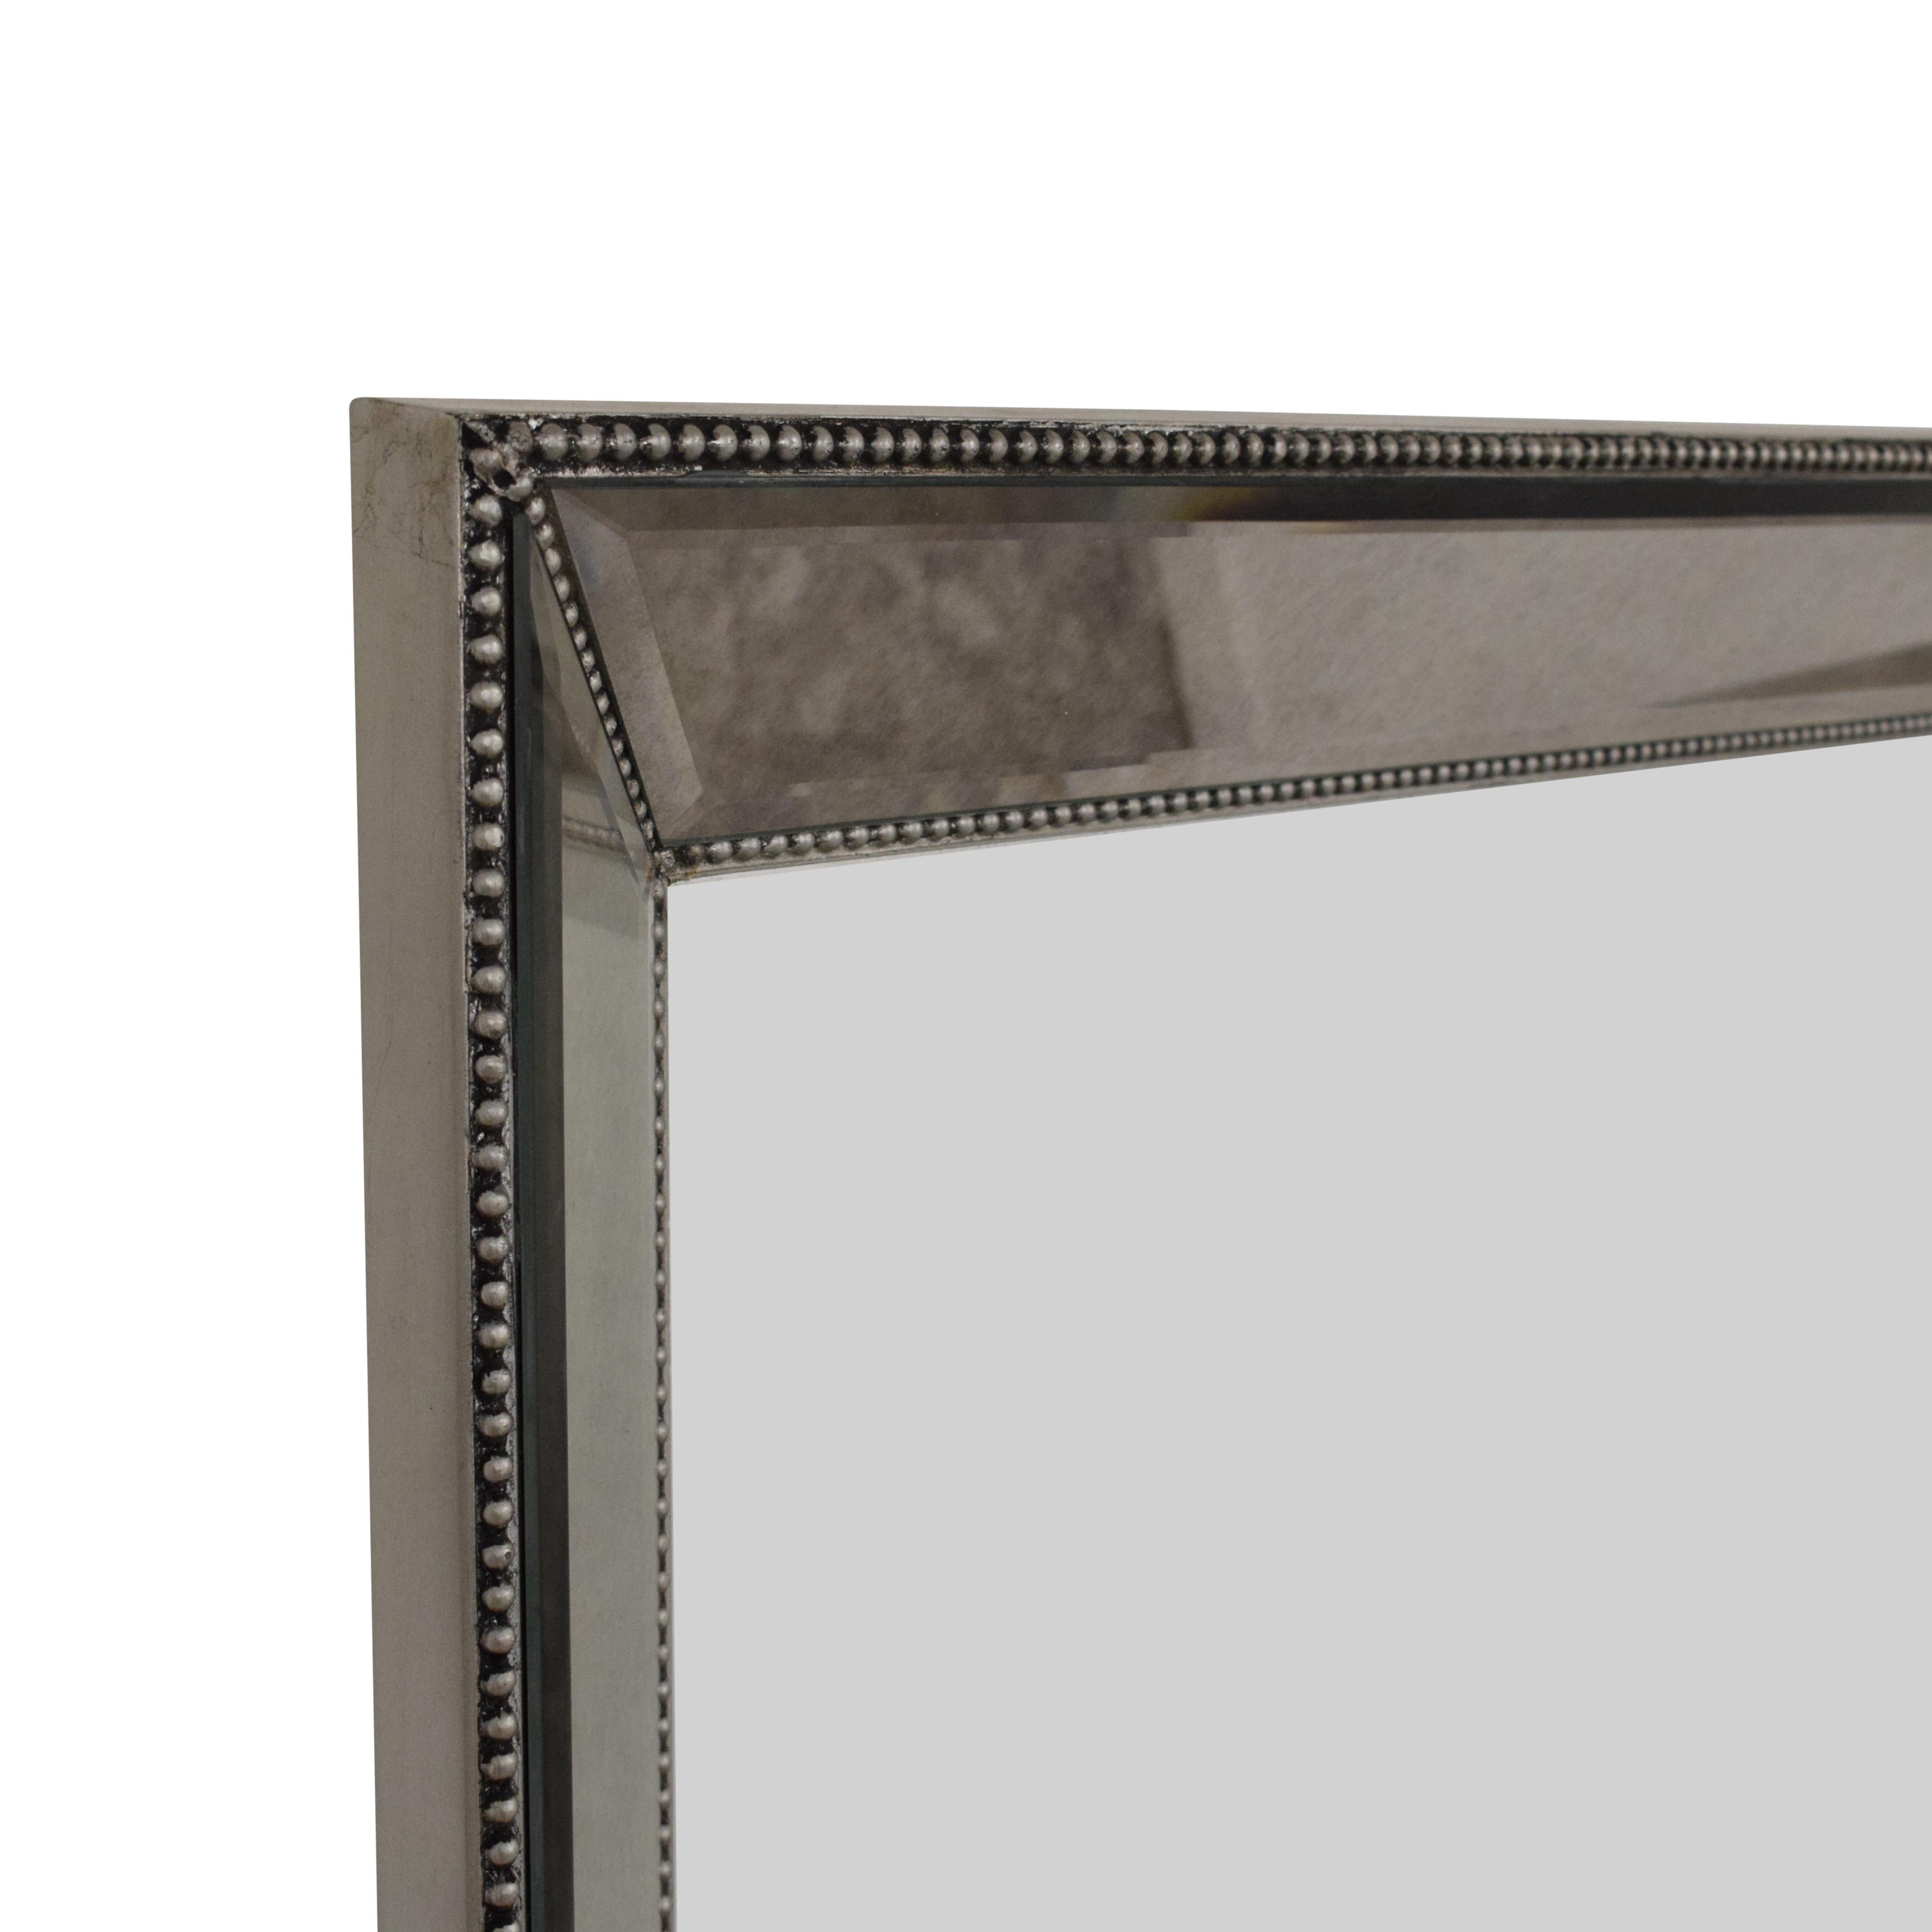 Macy's Macy's Marais Mirrored Floor Mirror used